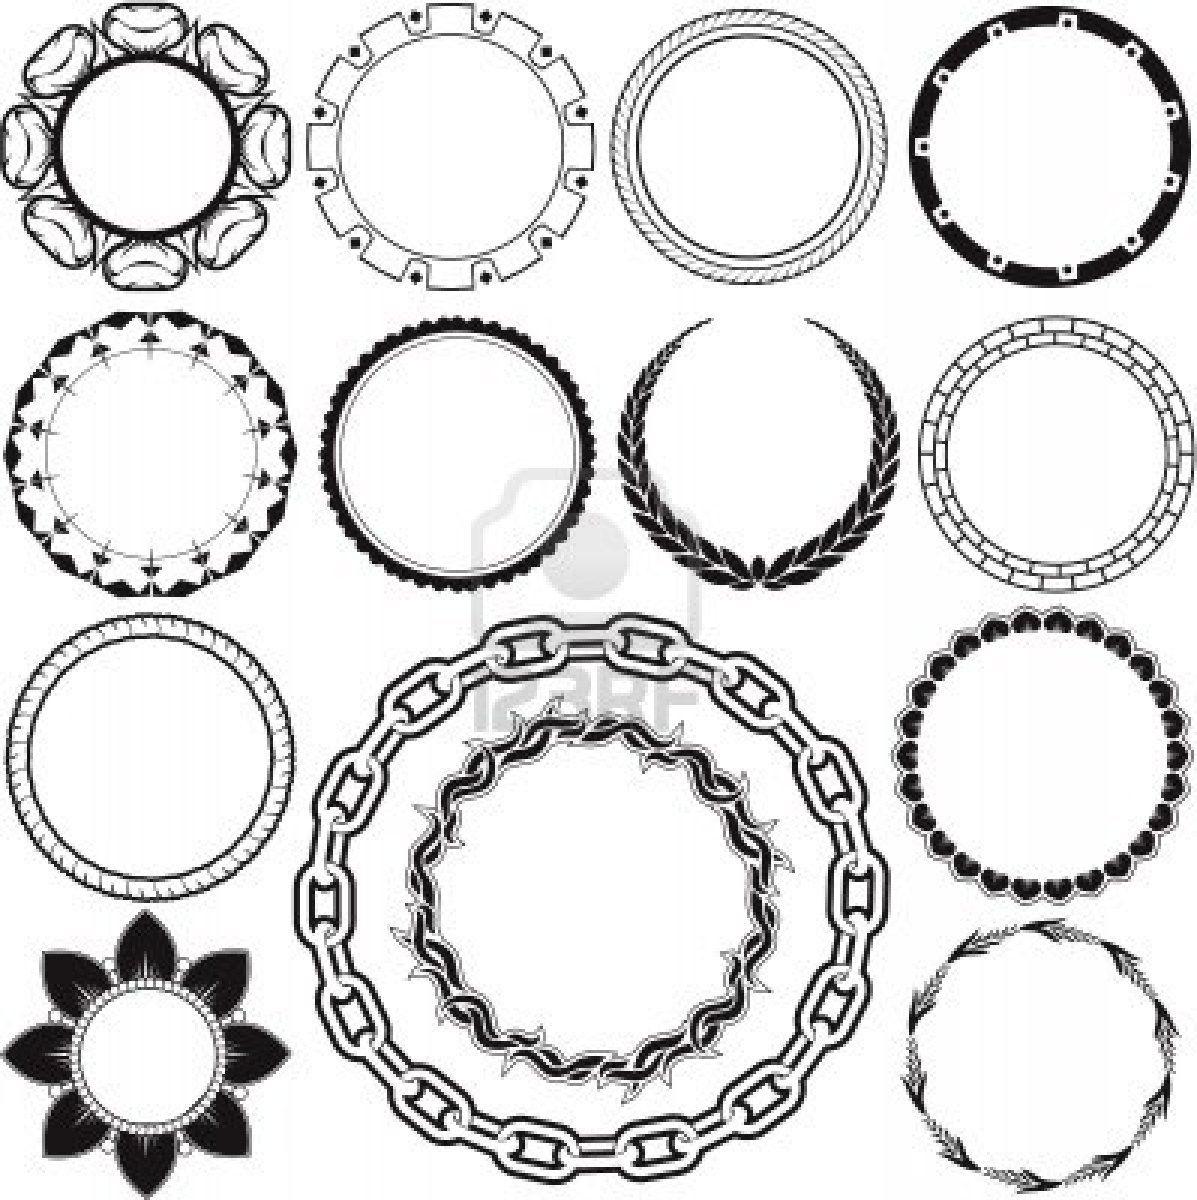 Tattoo Designs Circle: Nice Circle Tattoo Designs